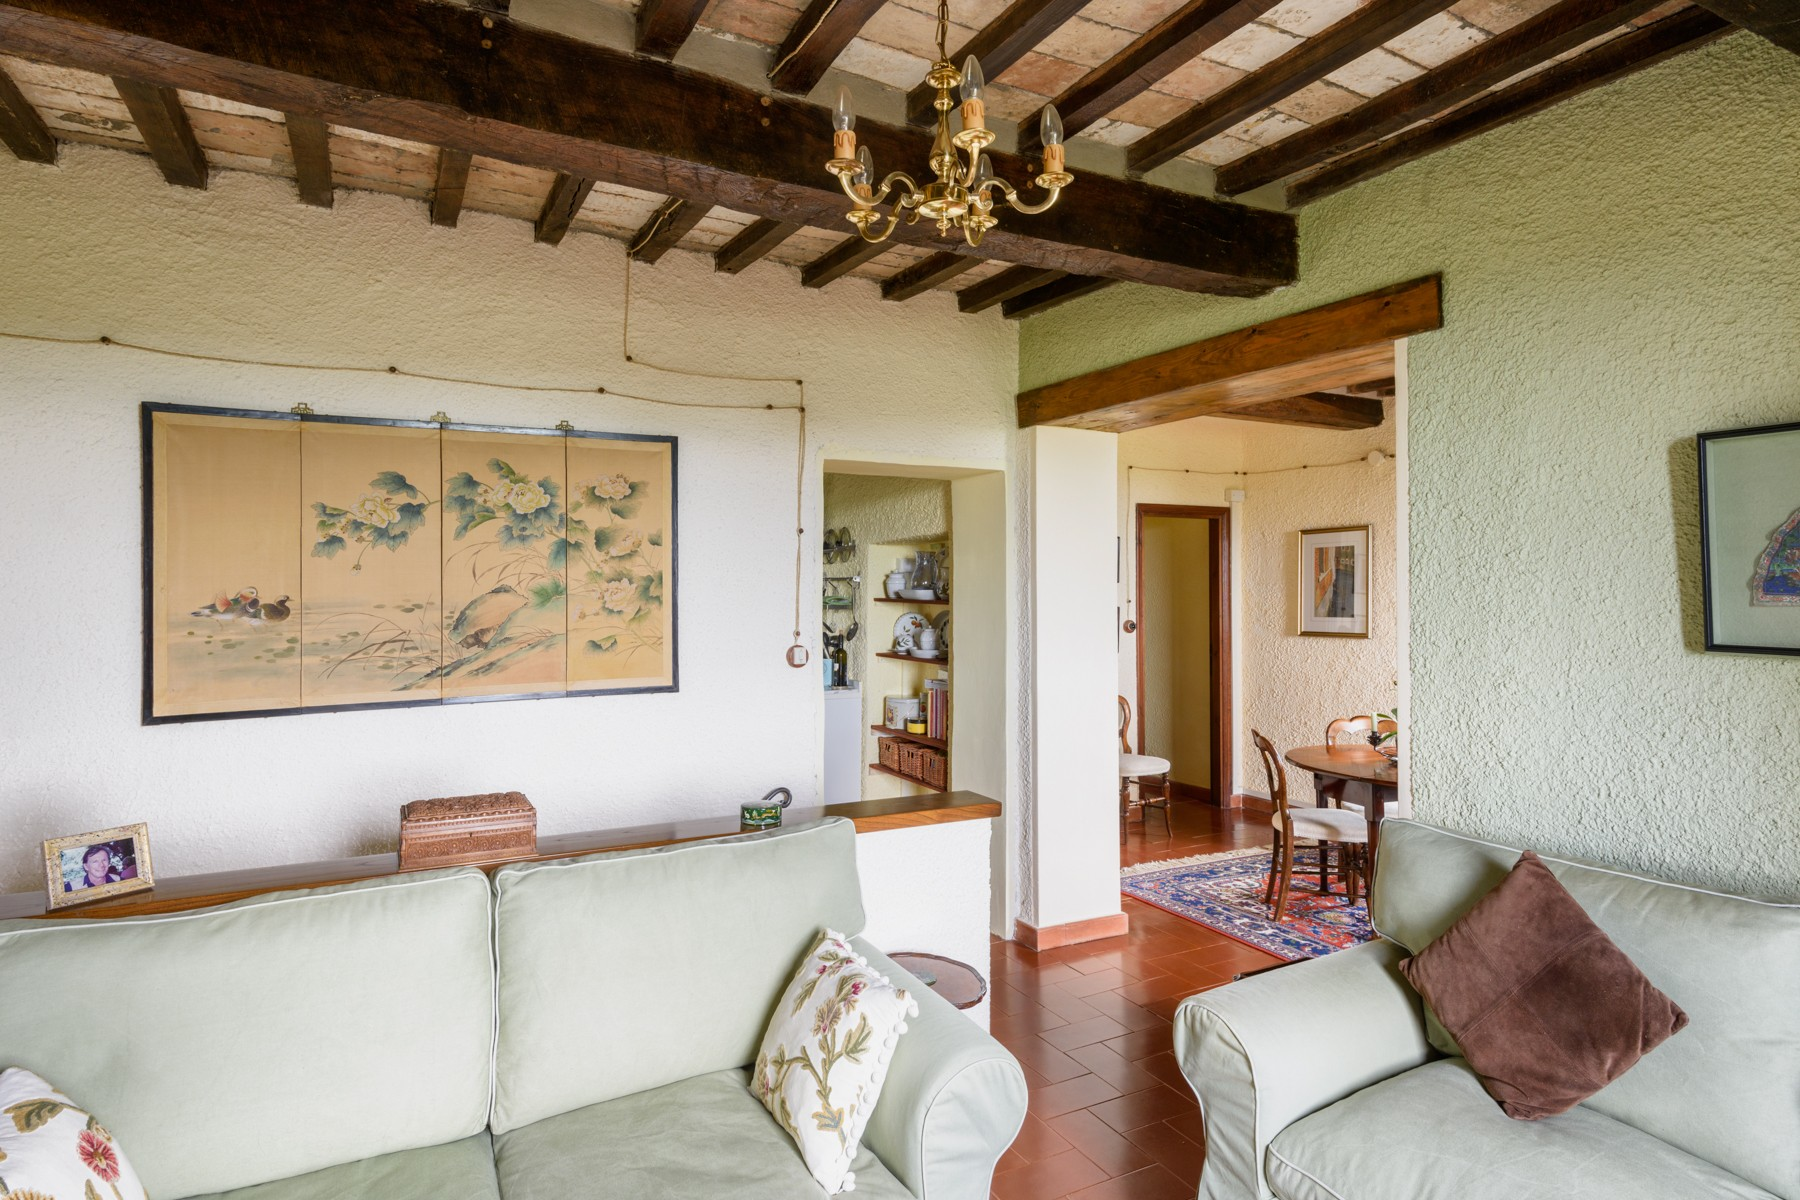 Casa indipendente in Vendita a Semproniano: 4 locali, 220 mq - Foto 10